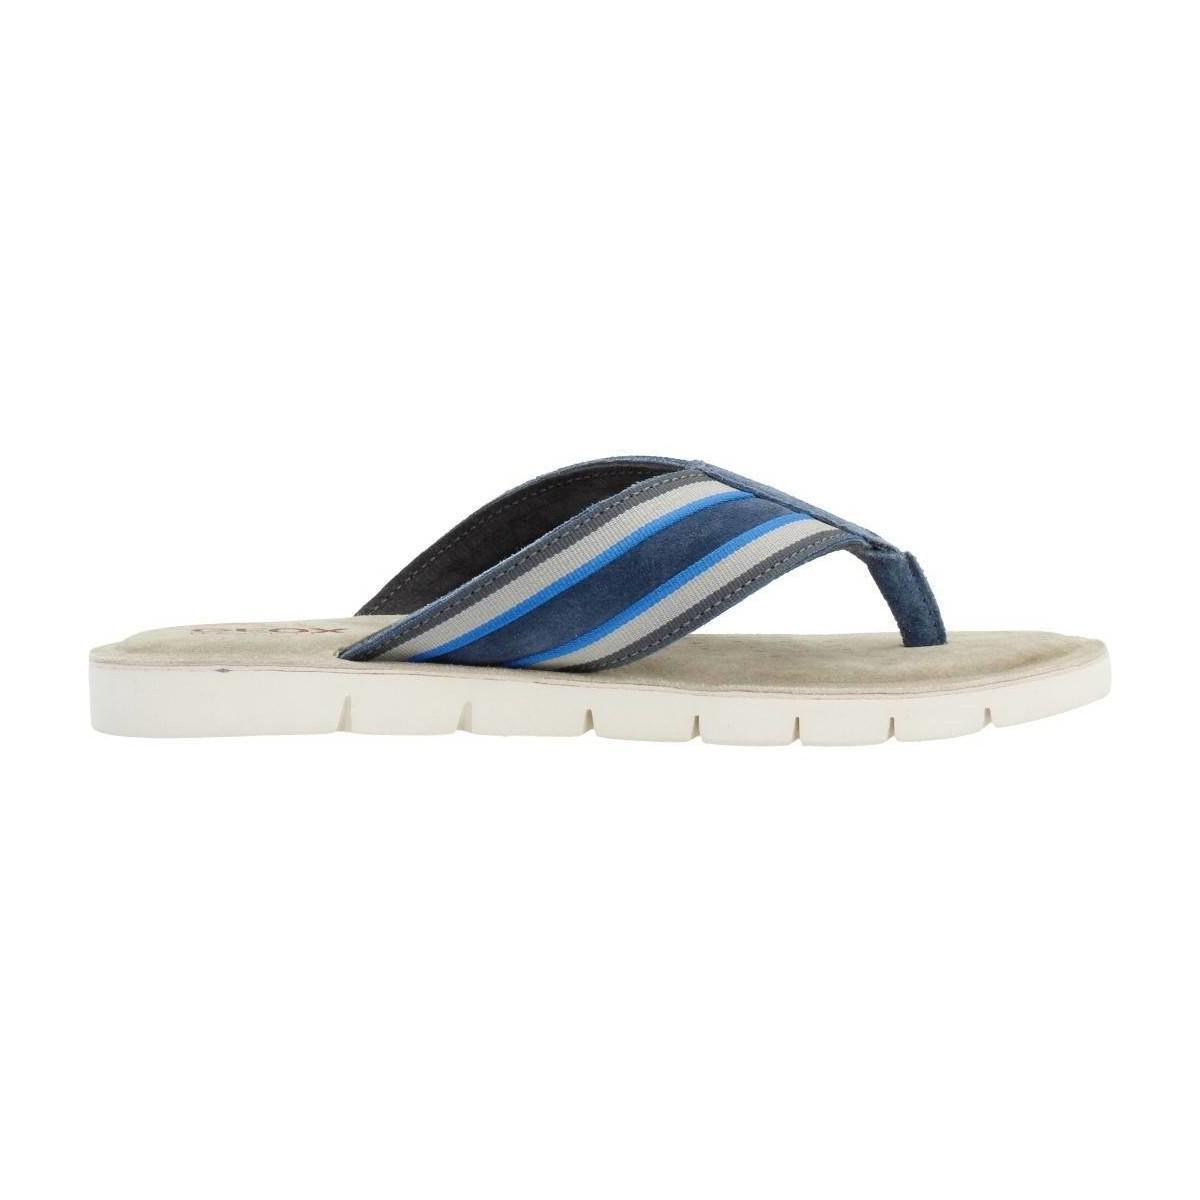 efd7995c65 Geox U Glenn Men's Flip Flops / Sandals (shoes) In Blue in Blue for ...